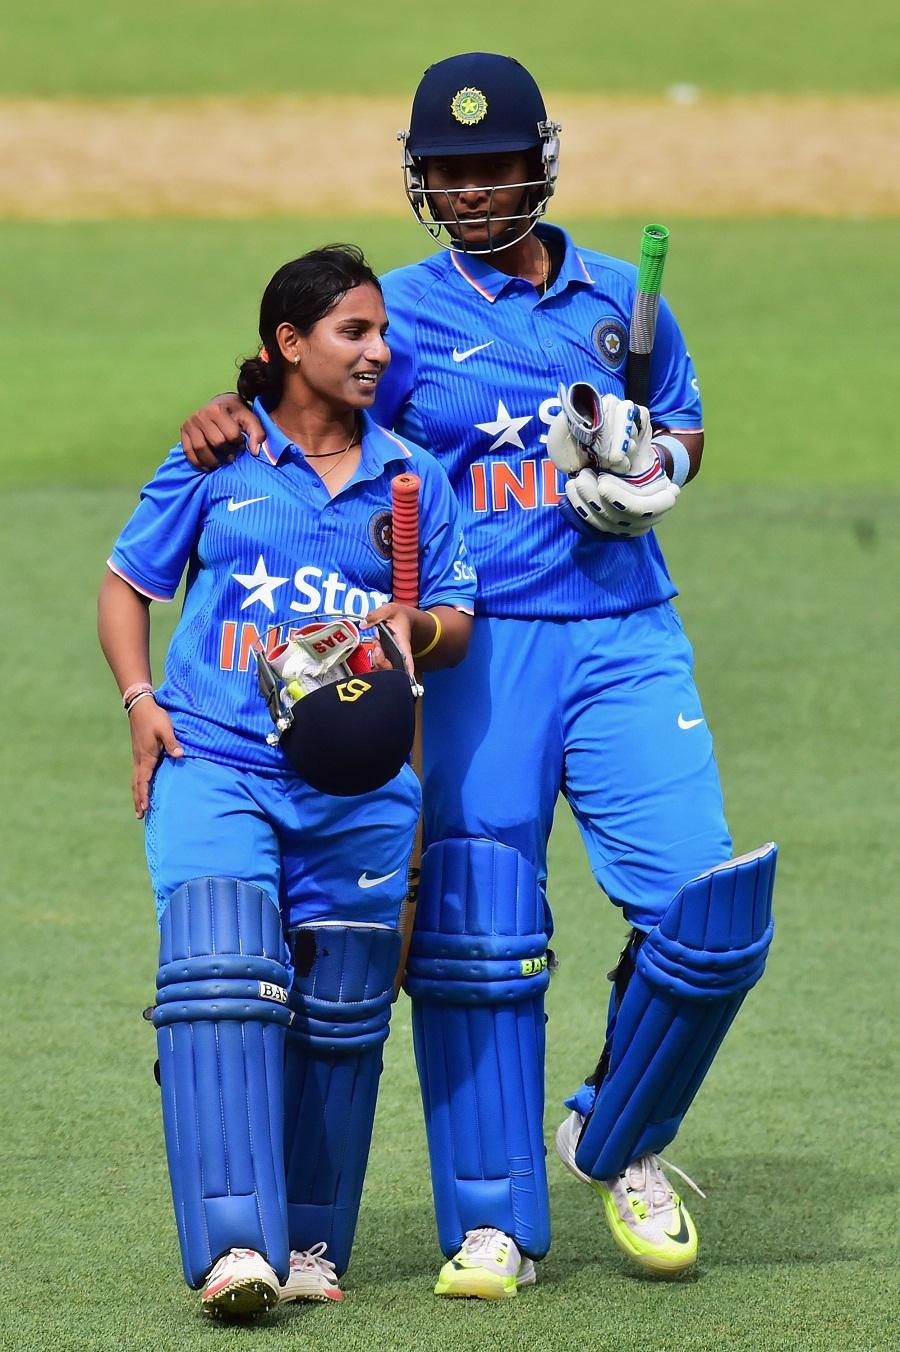 Yet to Make Debut in Senior Cricket, Mumbai Girl Jemimah Rodrigues Makes it to India A Team 2